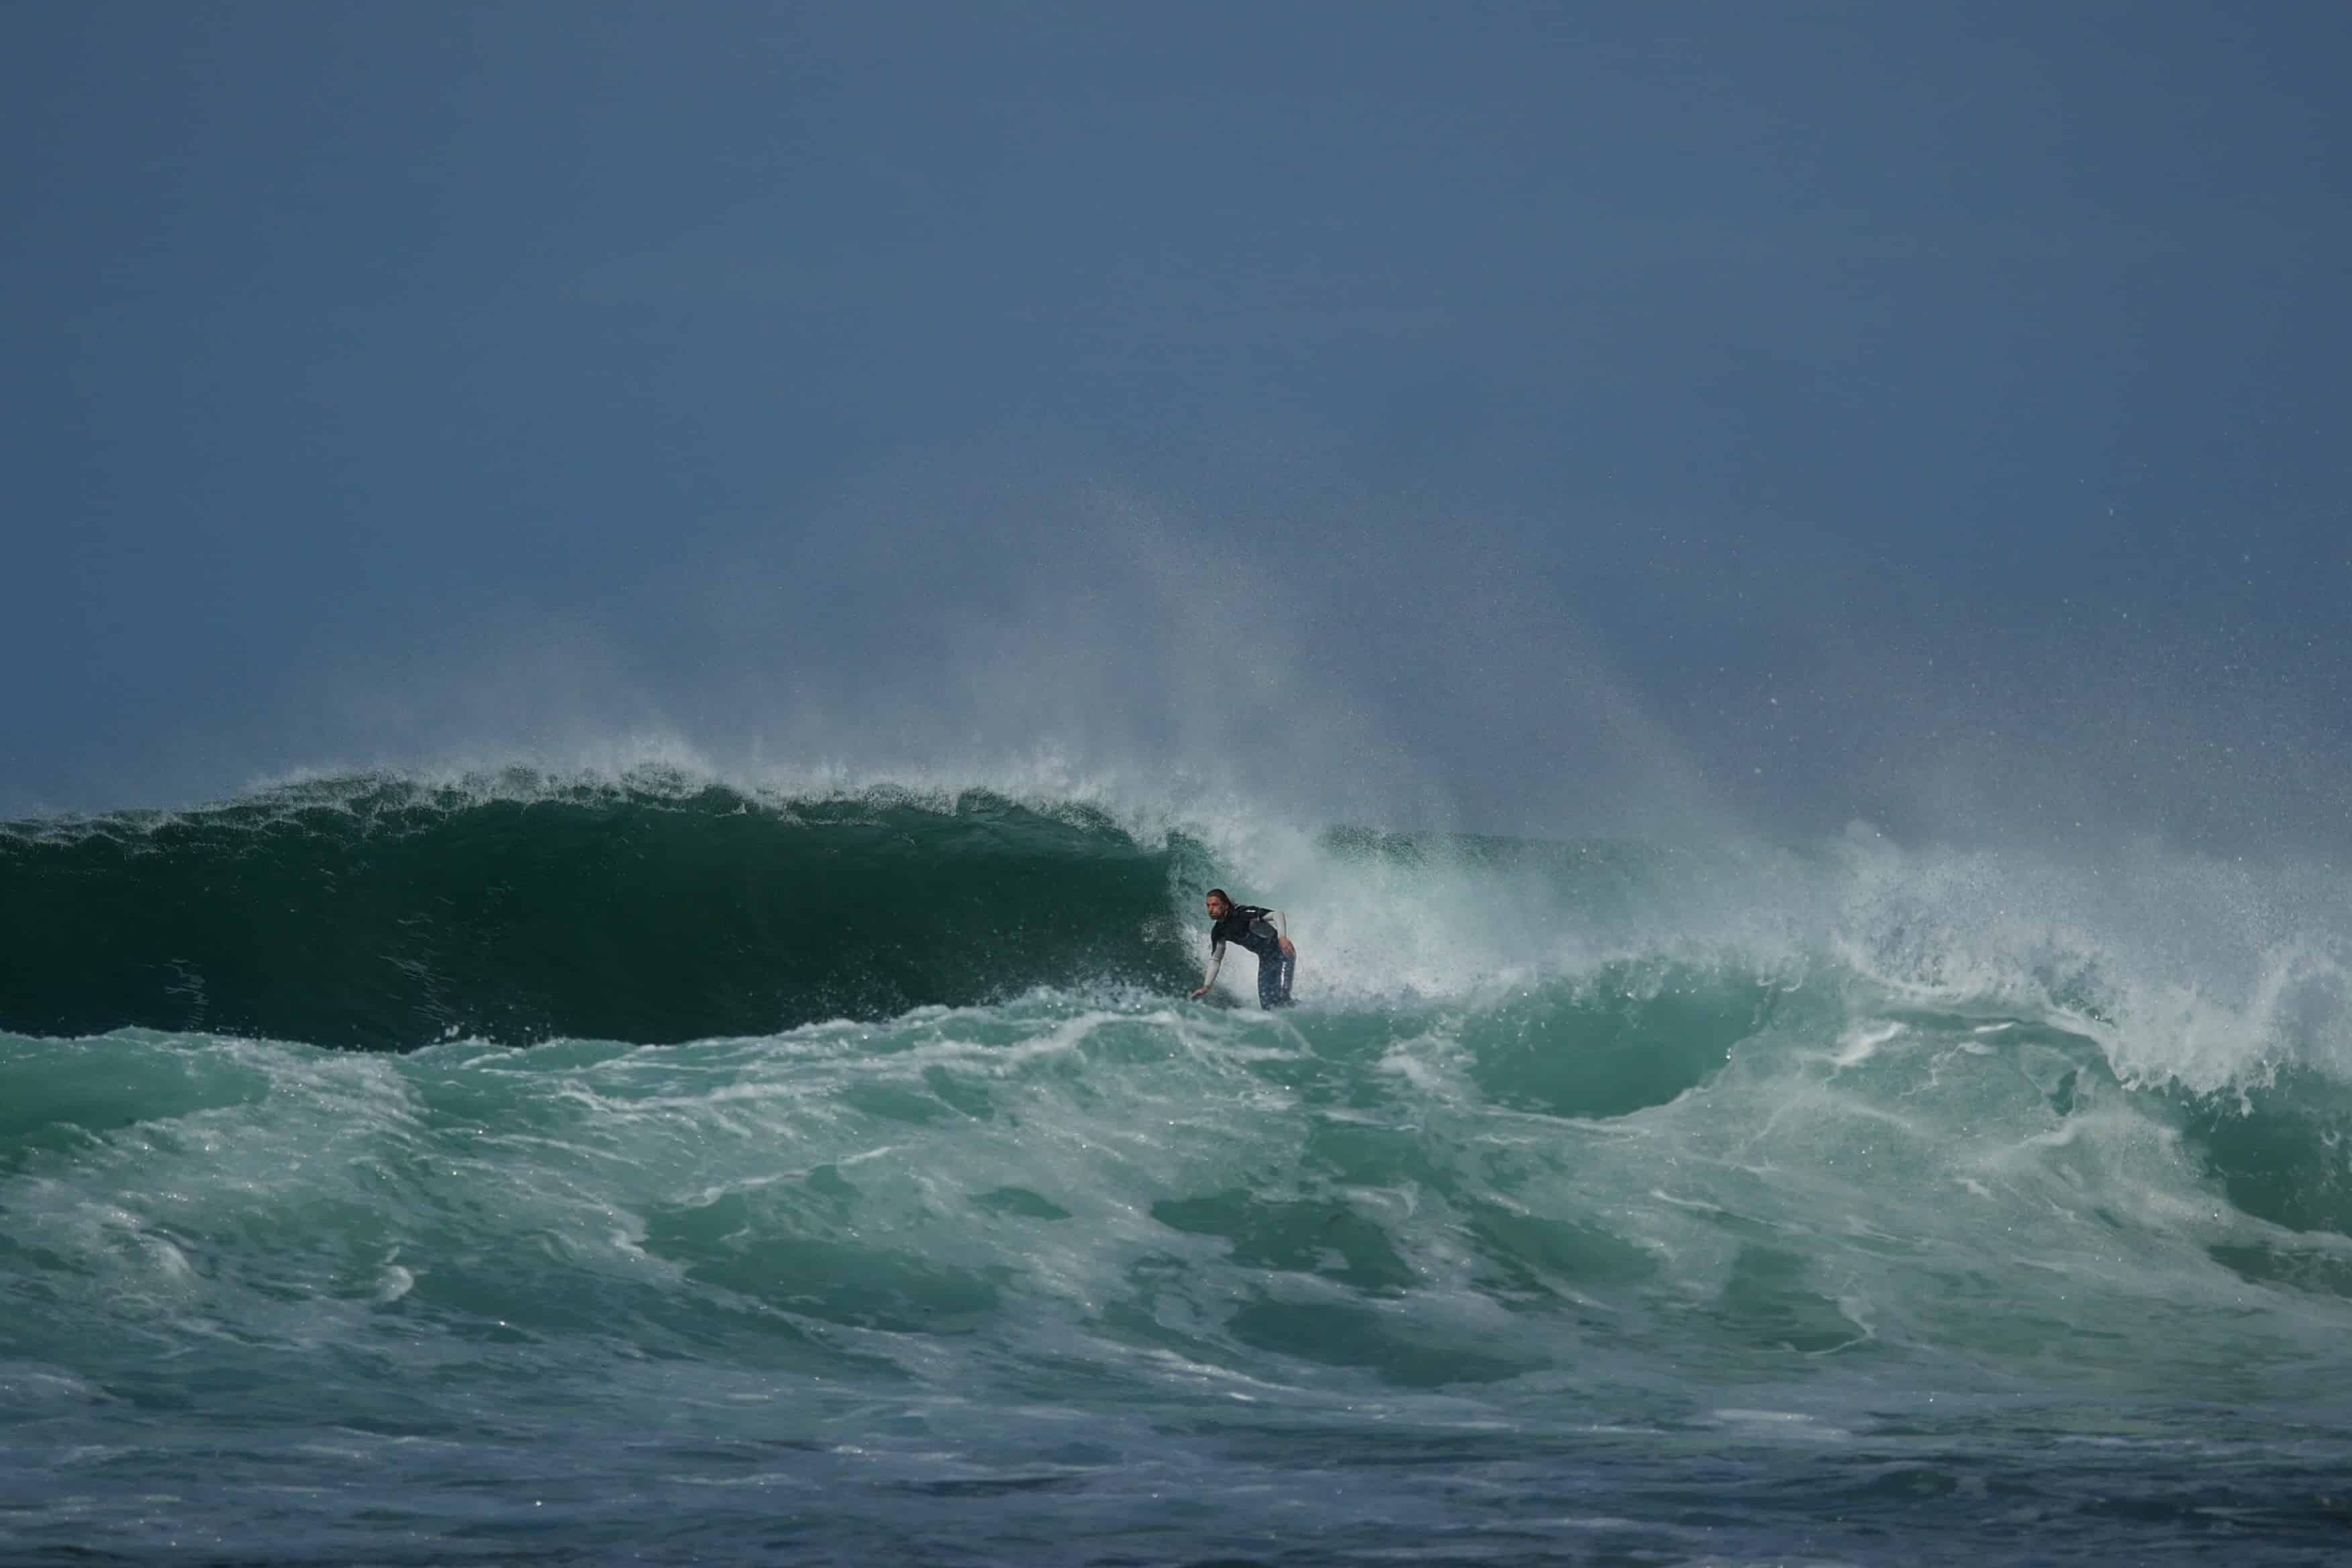 Goa jager tuben - Foto: Sigve Brochmann Rasmussen